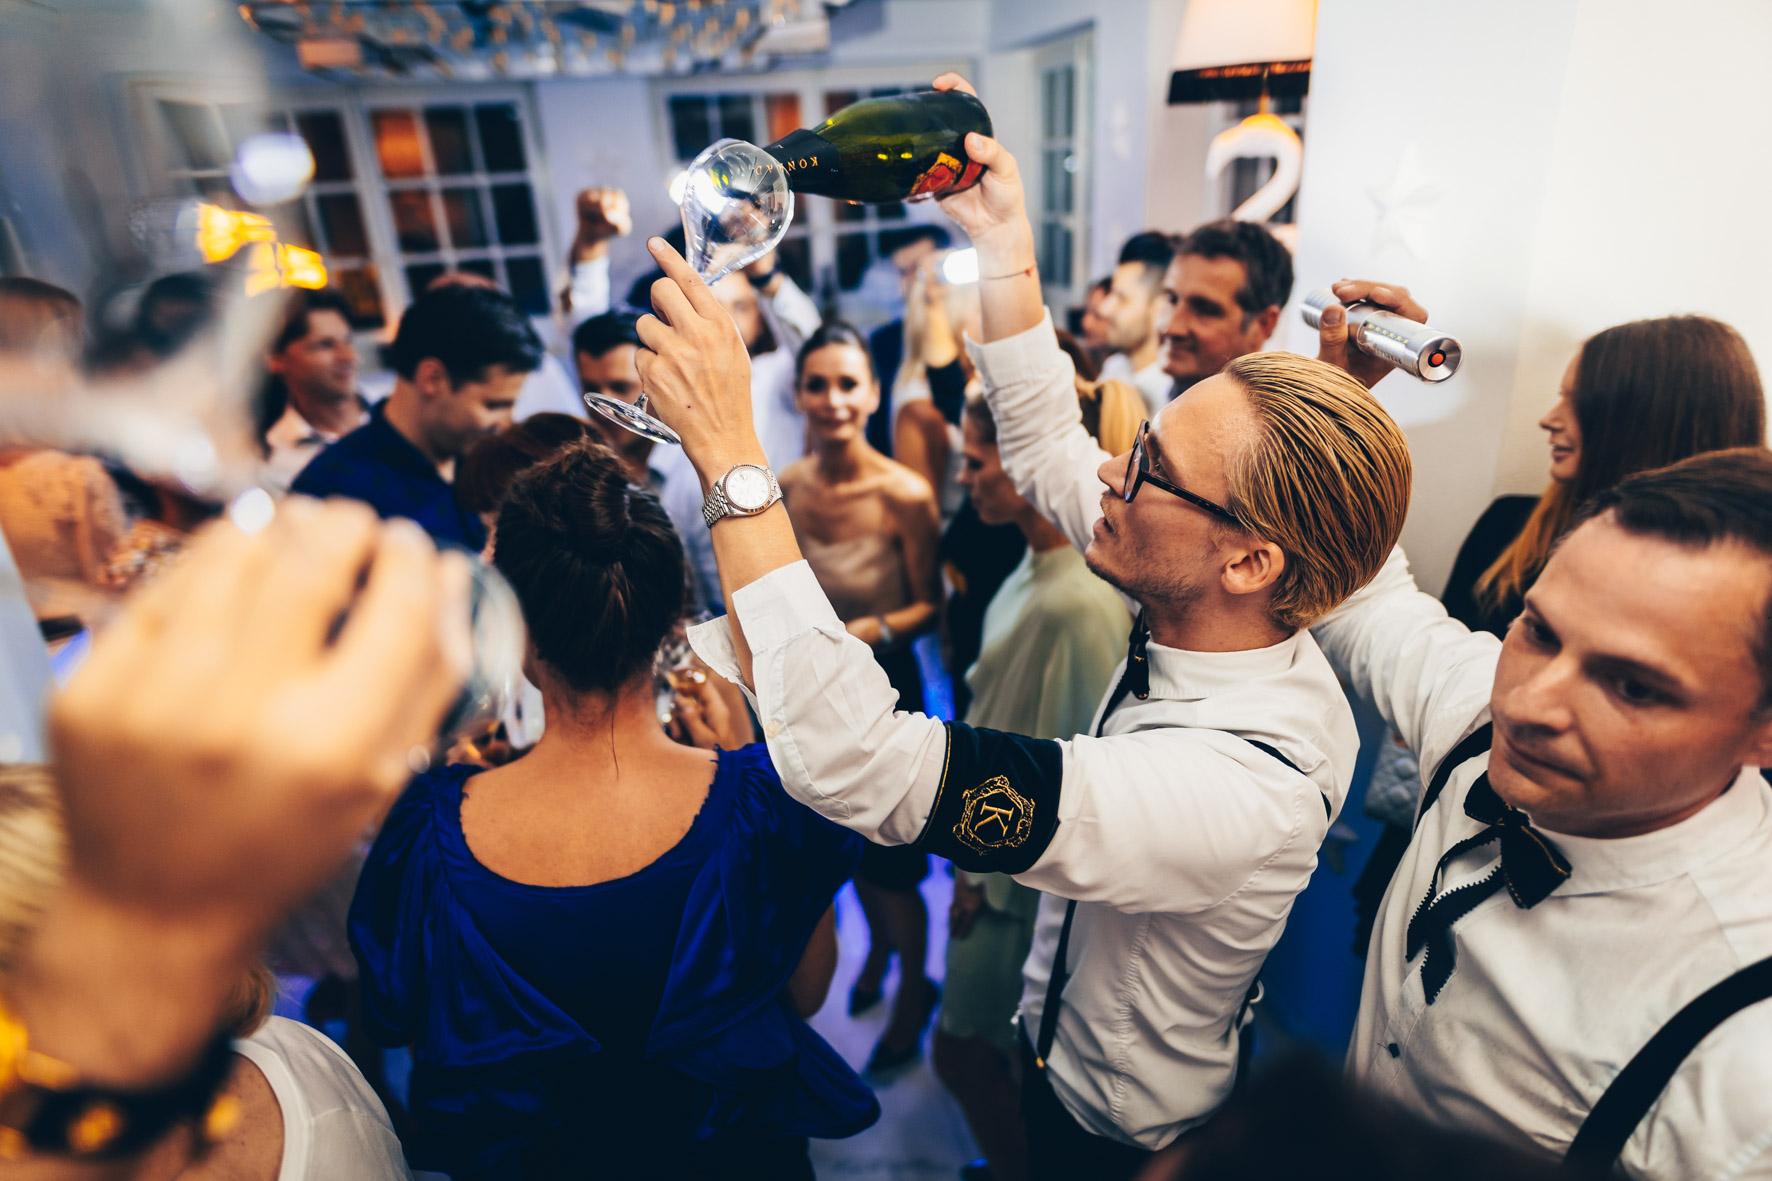 Konrad-lifestyle-art-basel-%22gold-member-experience%22-2019-133.jpg